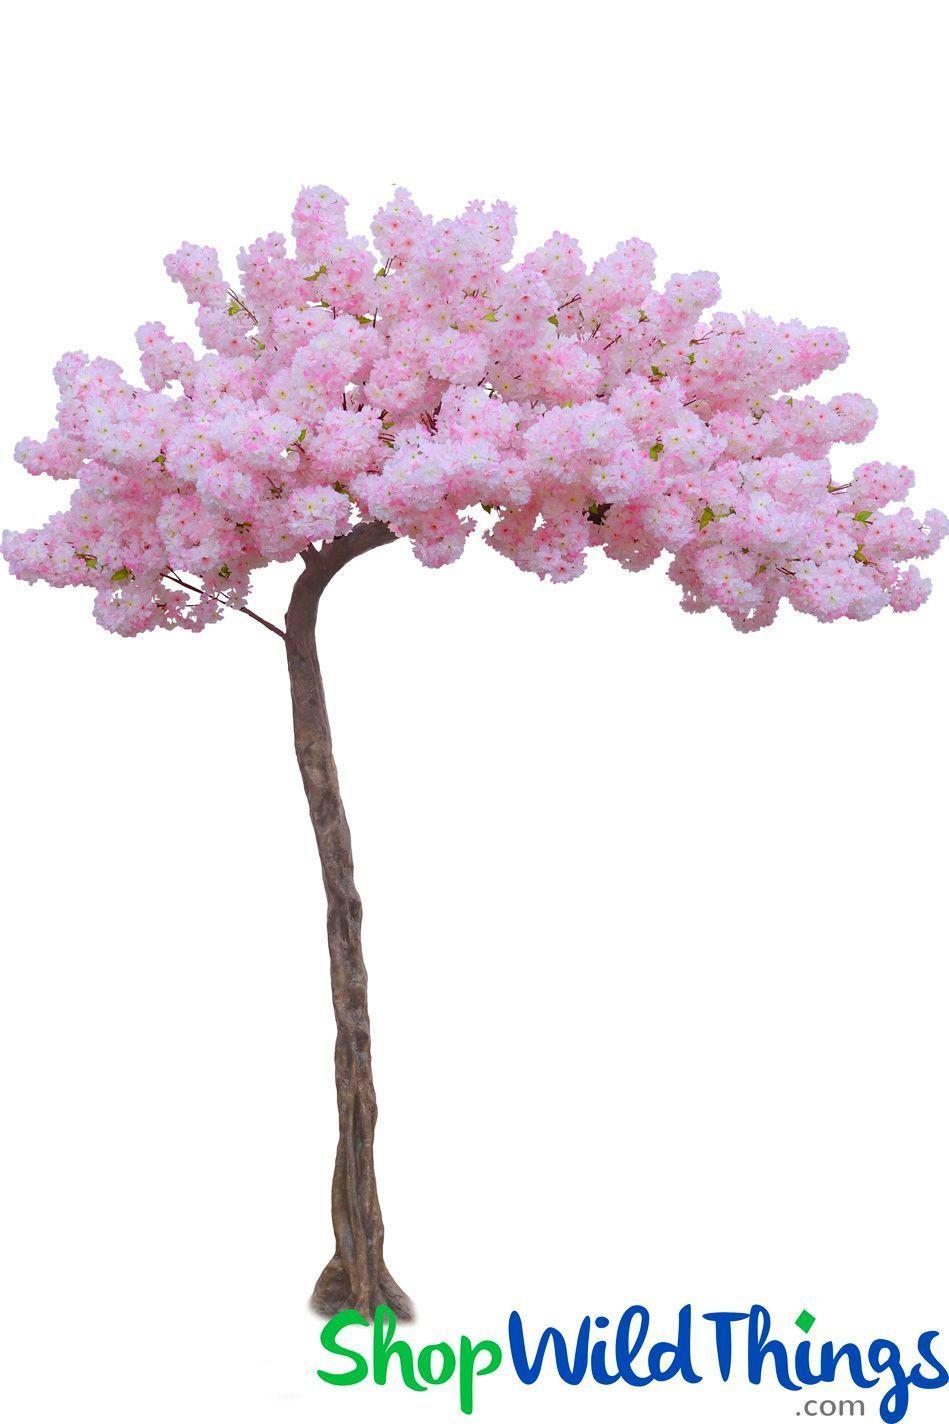 Flowering Dogwood Tree Pink 11 Feet Tall x 8 Feet Wide